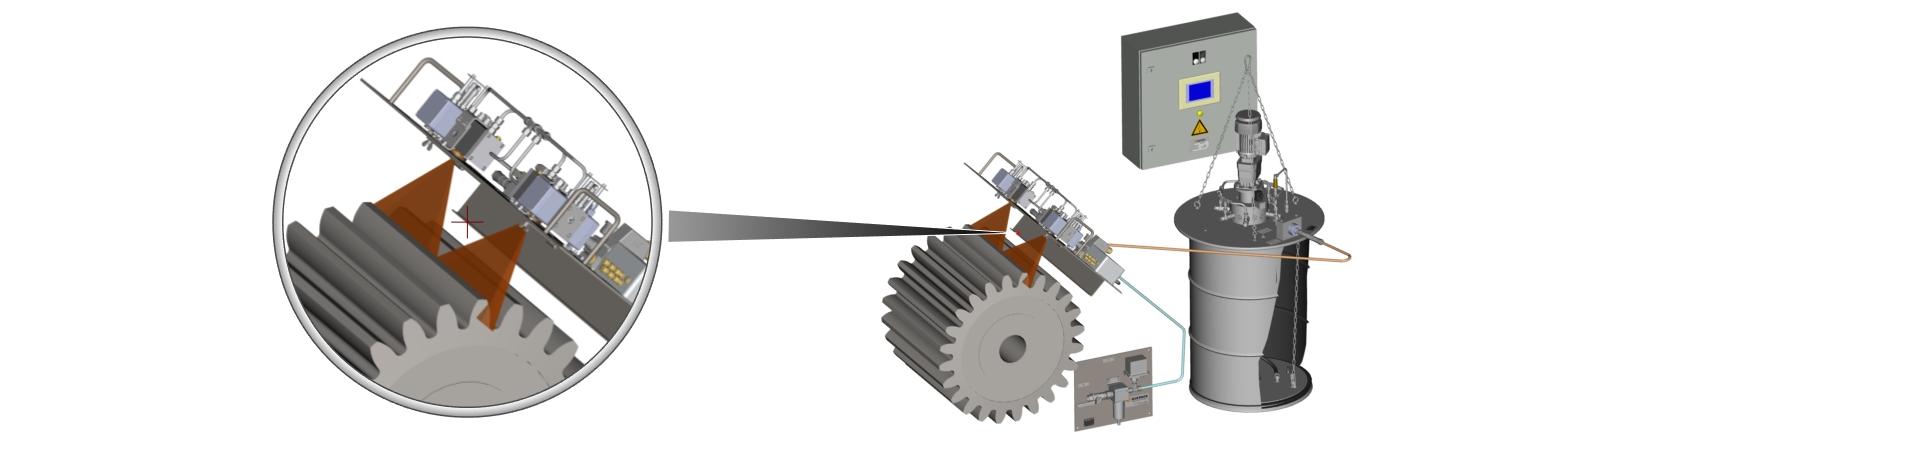 Spray Lubrication System - Woerner